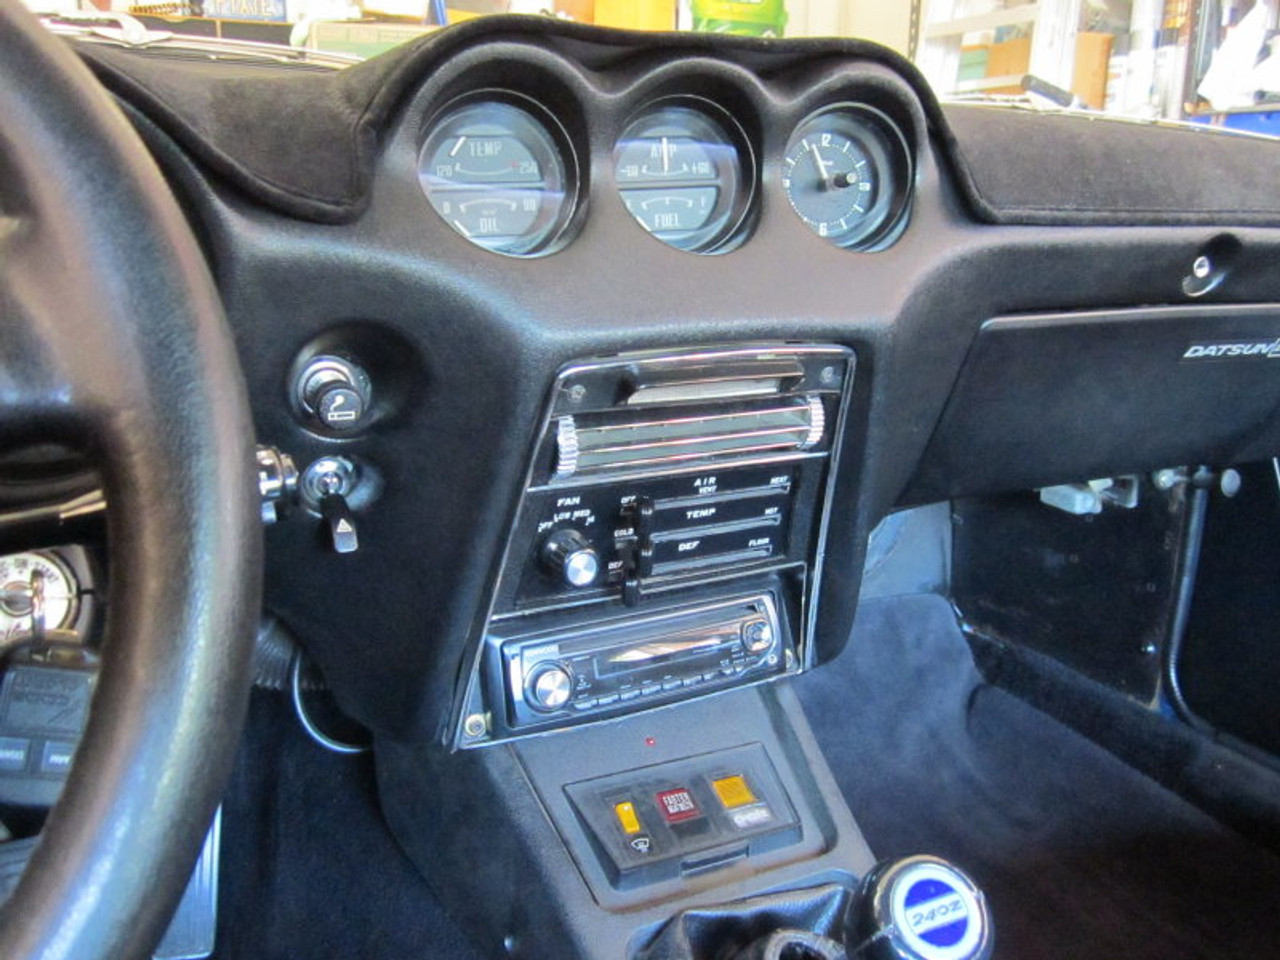 1970 1971 1972 1973 Datsun 240z Air Conditioning Heater